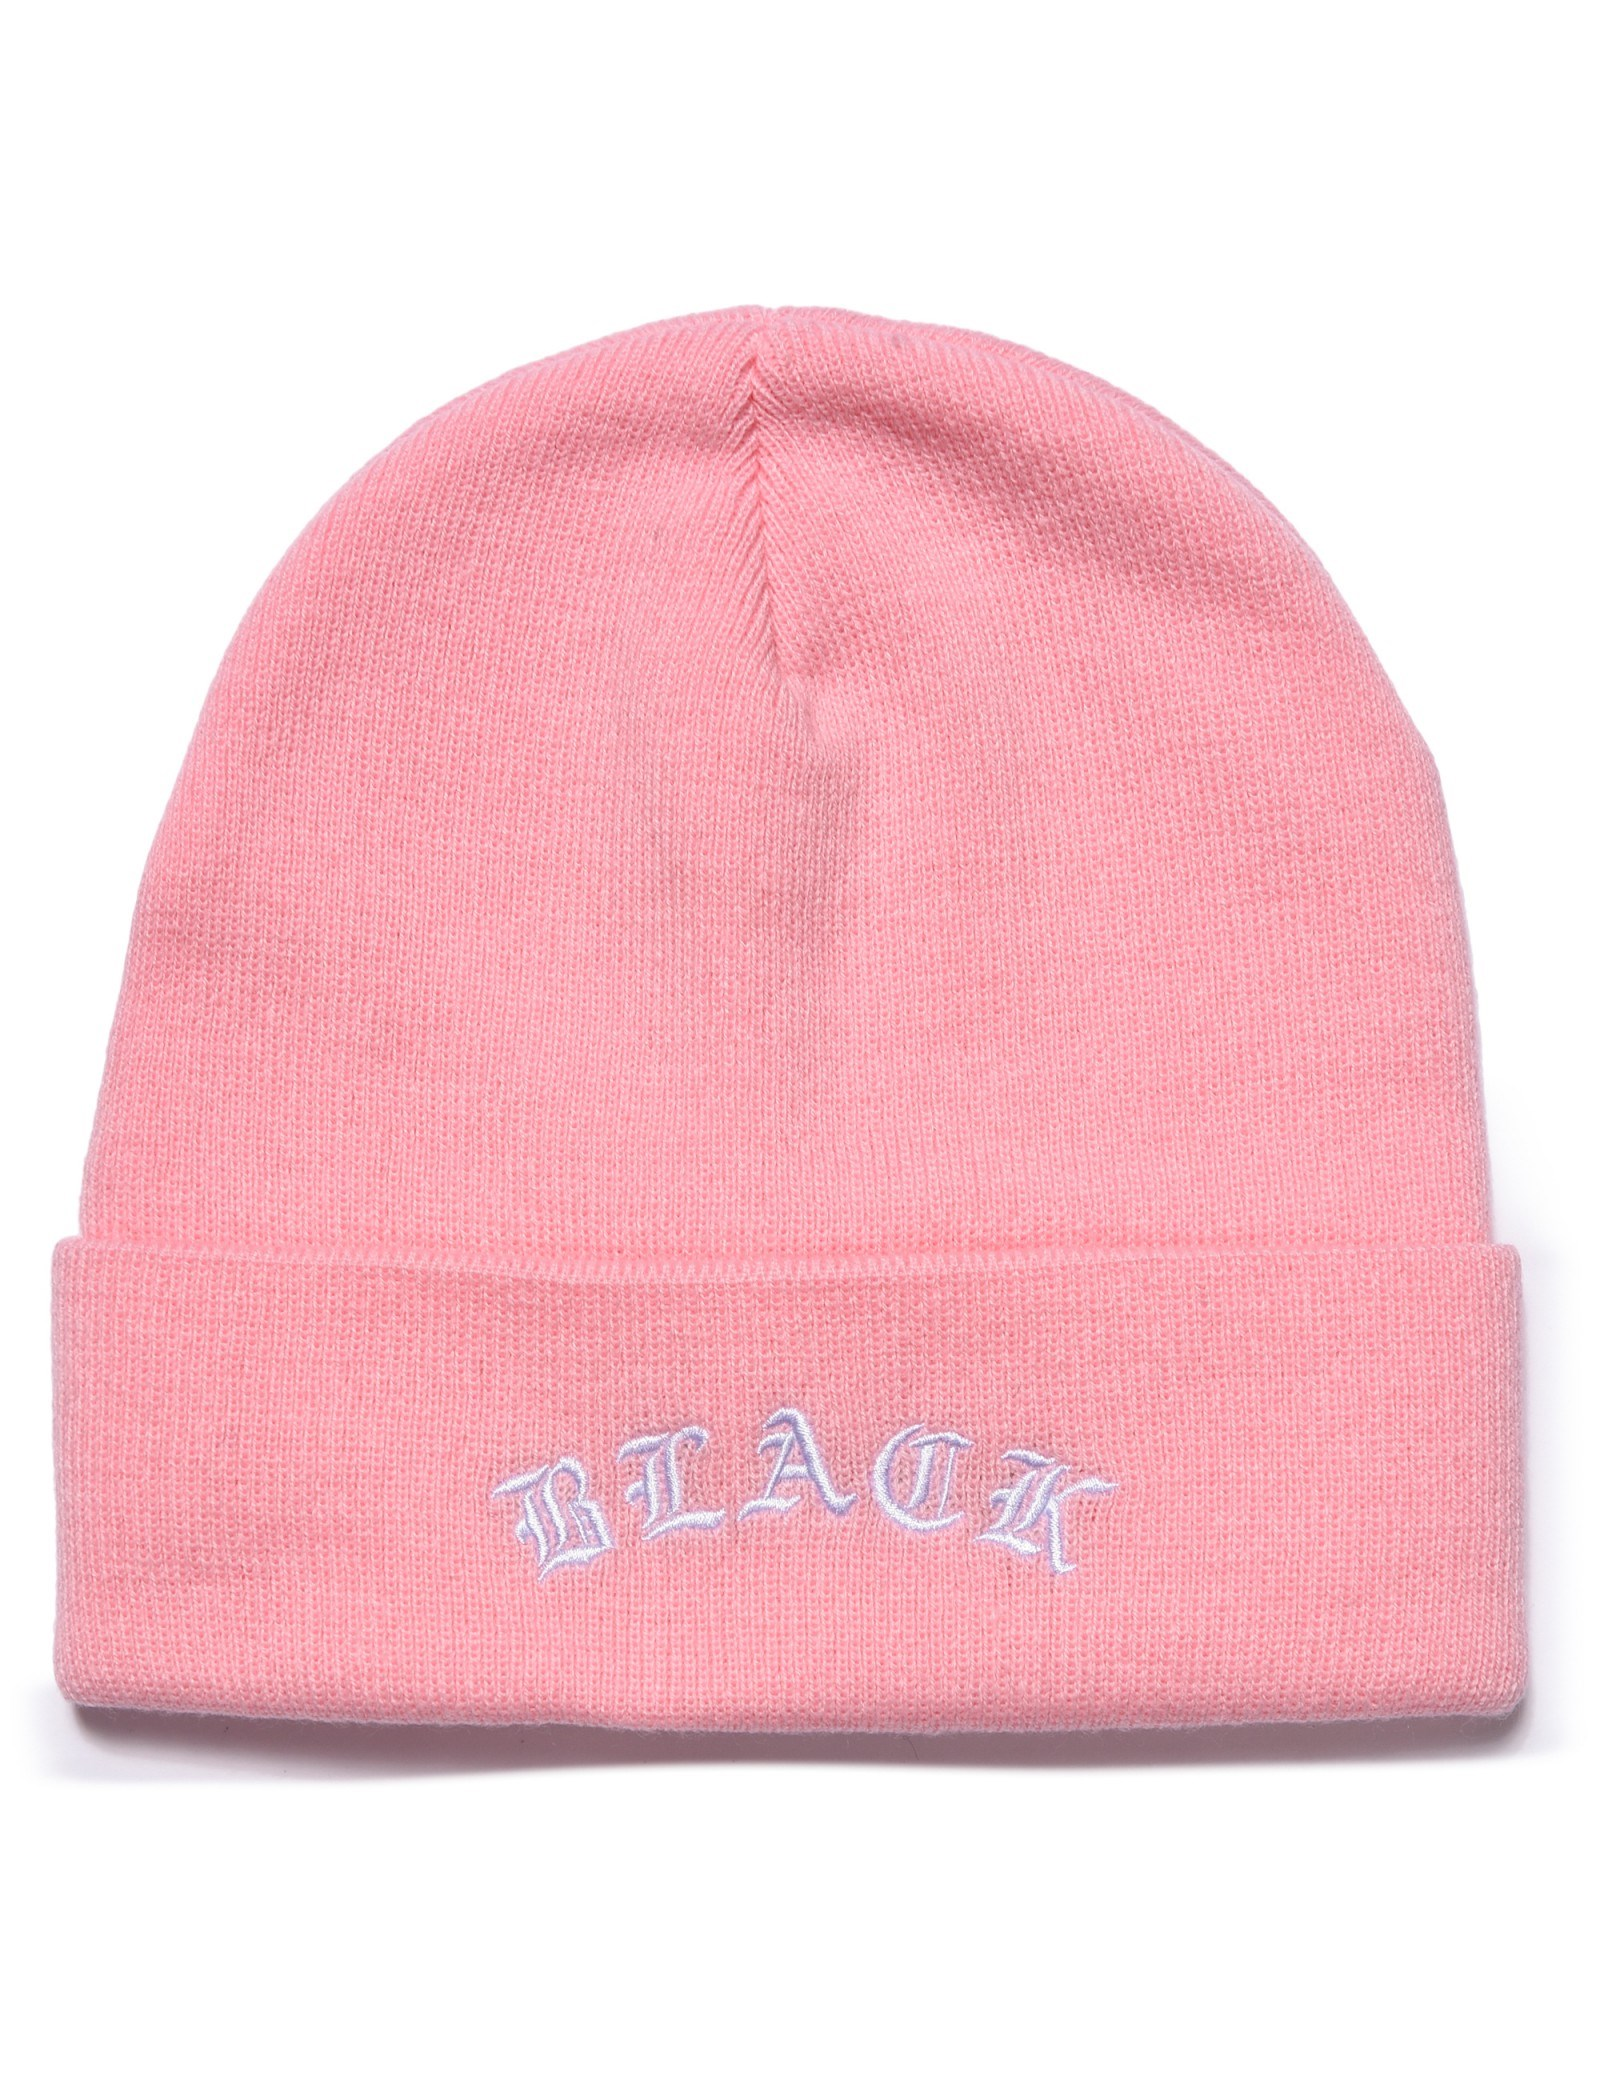 Шапка B-BLKLOGOAW-Pink    - Размер: ONE SIZE